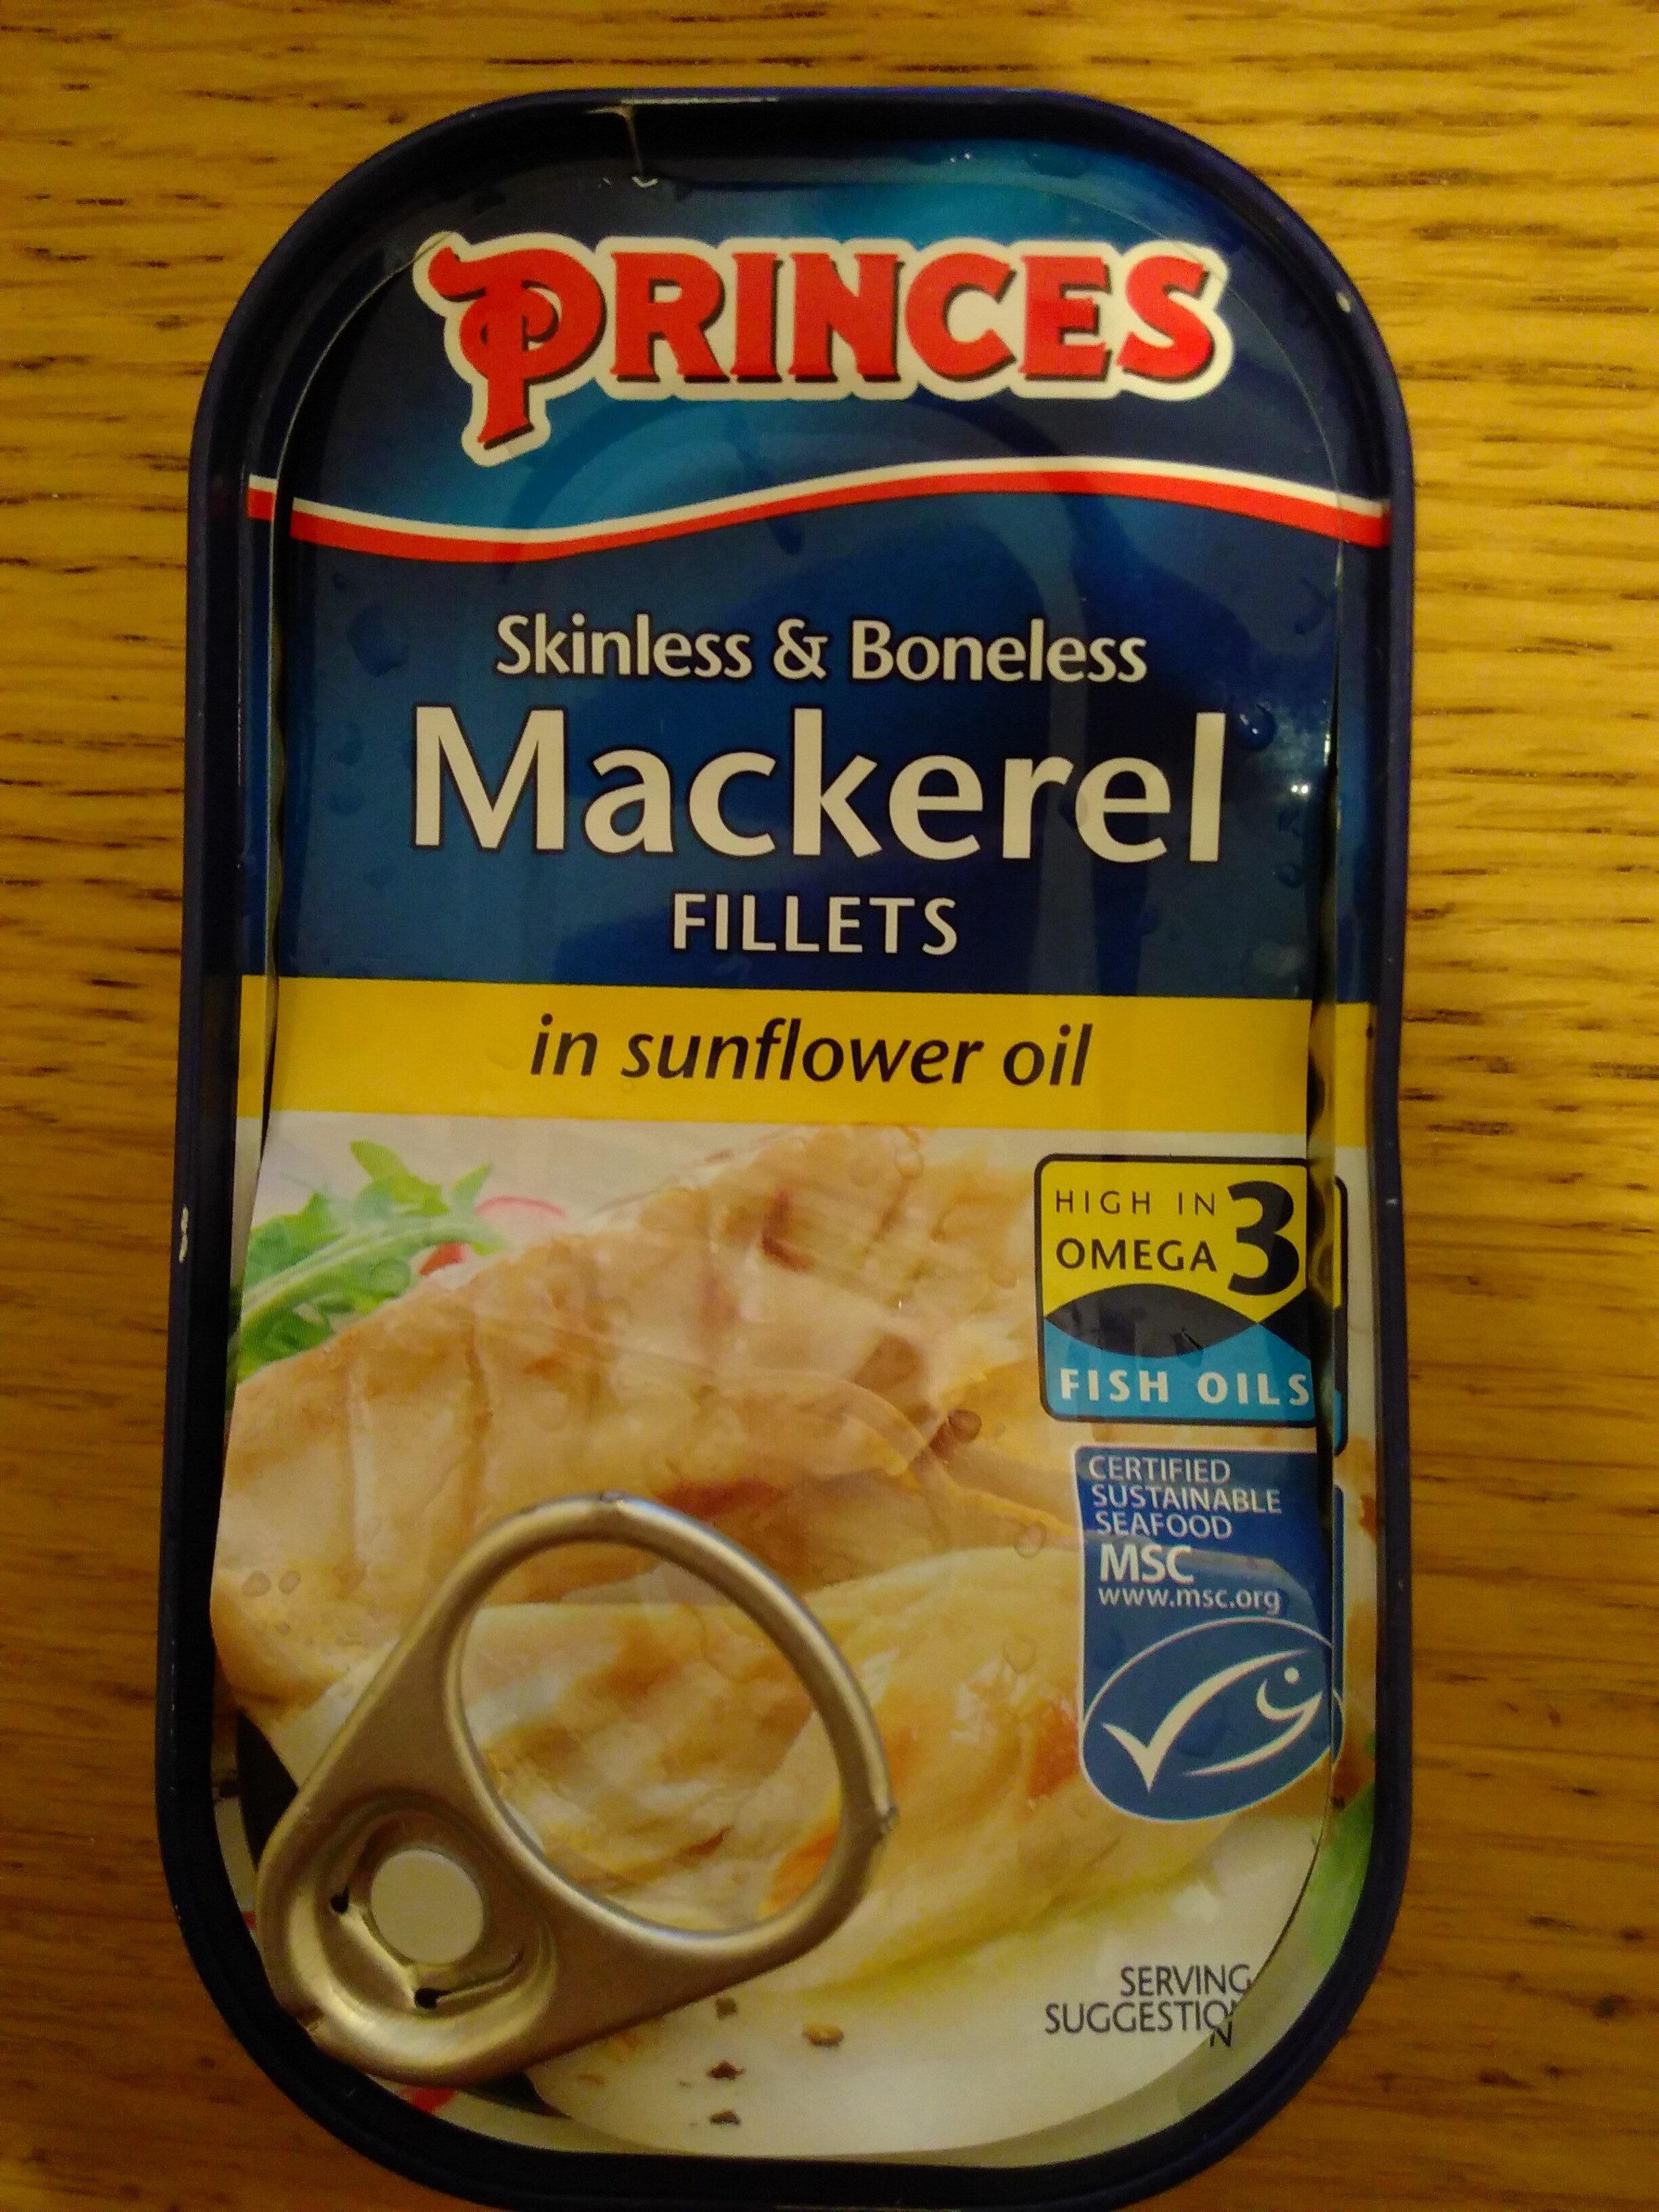 Mackerel Fillets in Sunflower Oil - Product